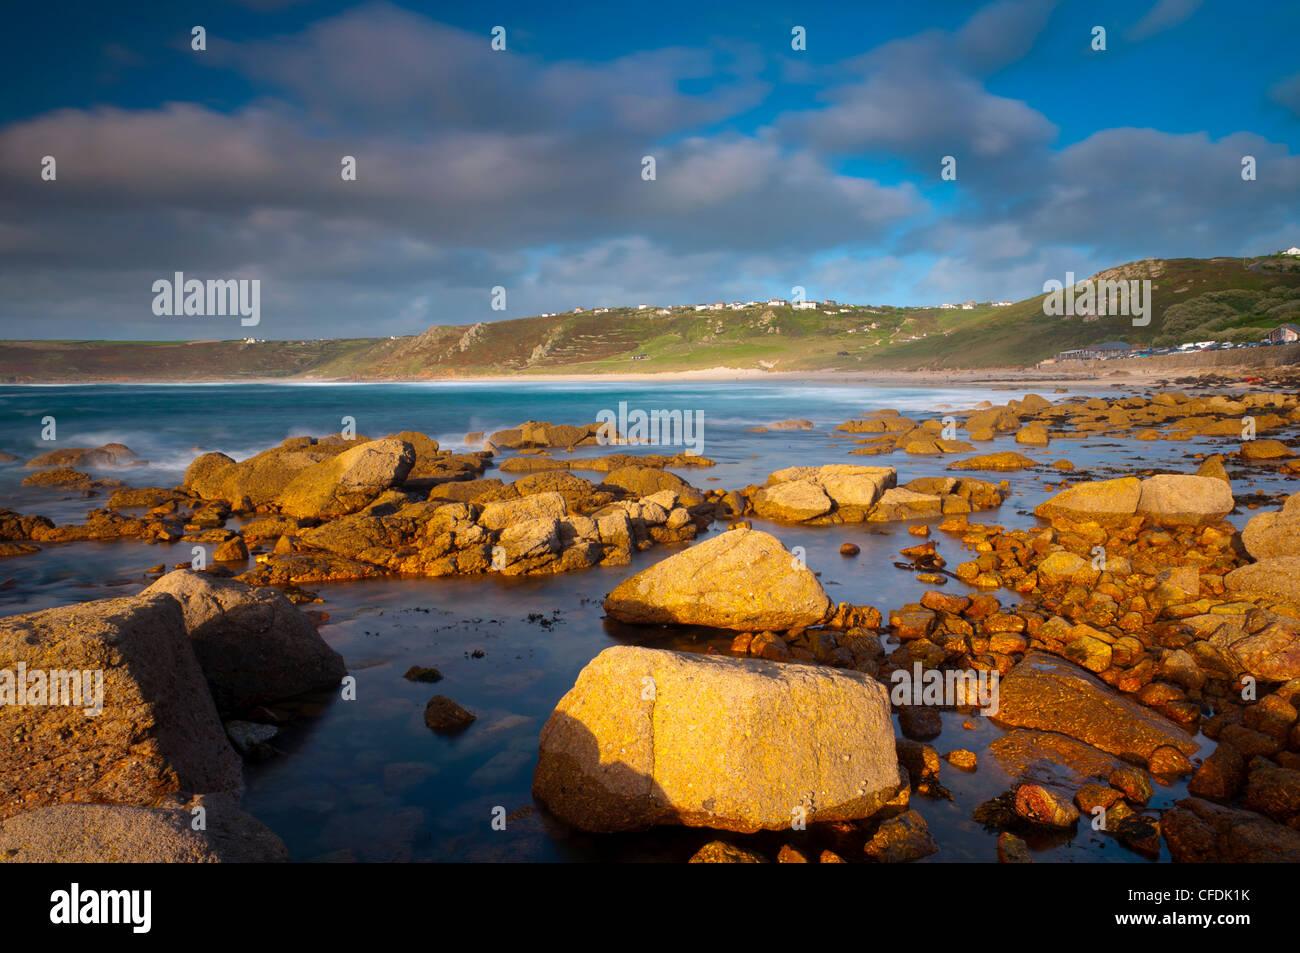 Sennen Cove, Whitesand Bay, Cornwall, Angleterre, Royaume-Uni, Europe Photo Stock